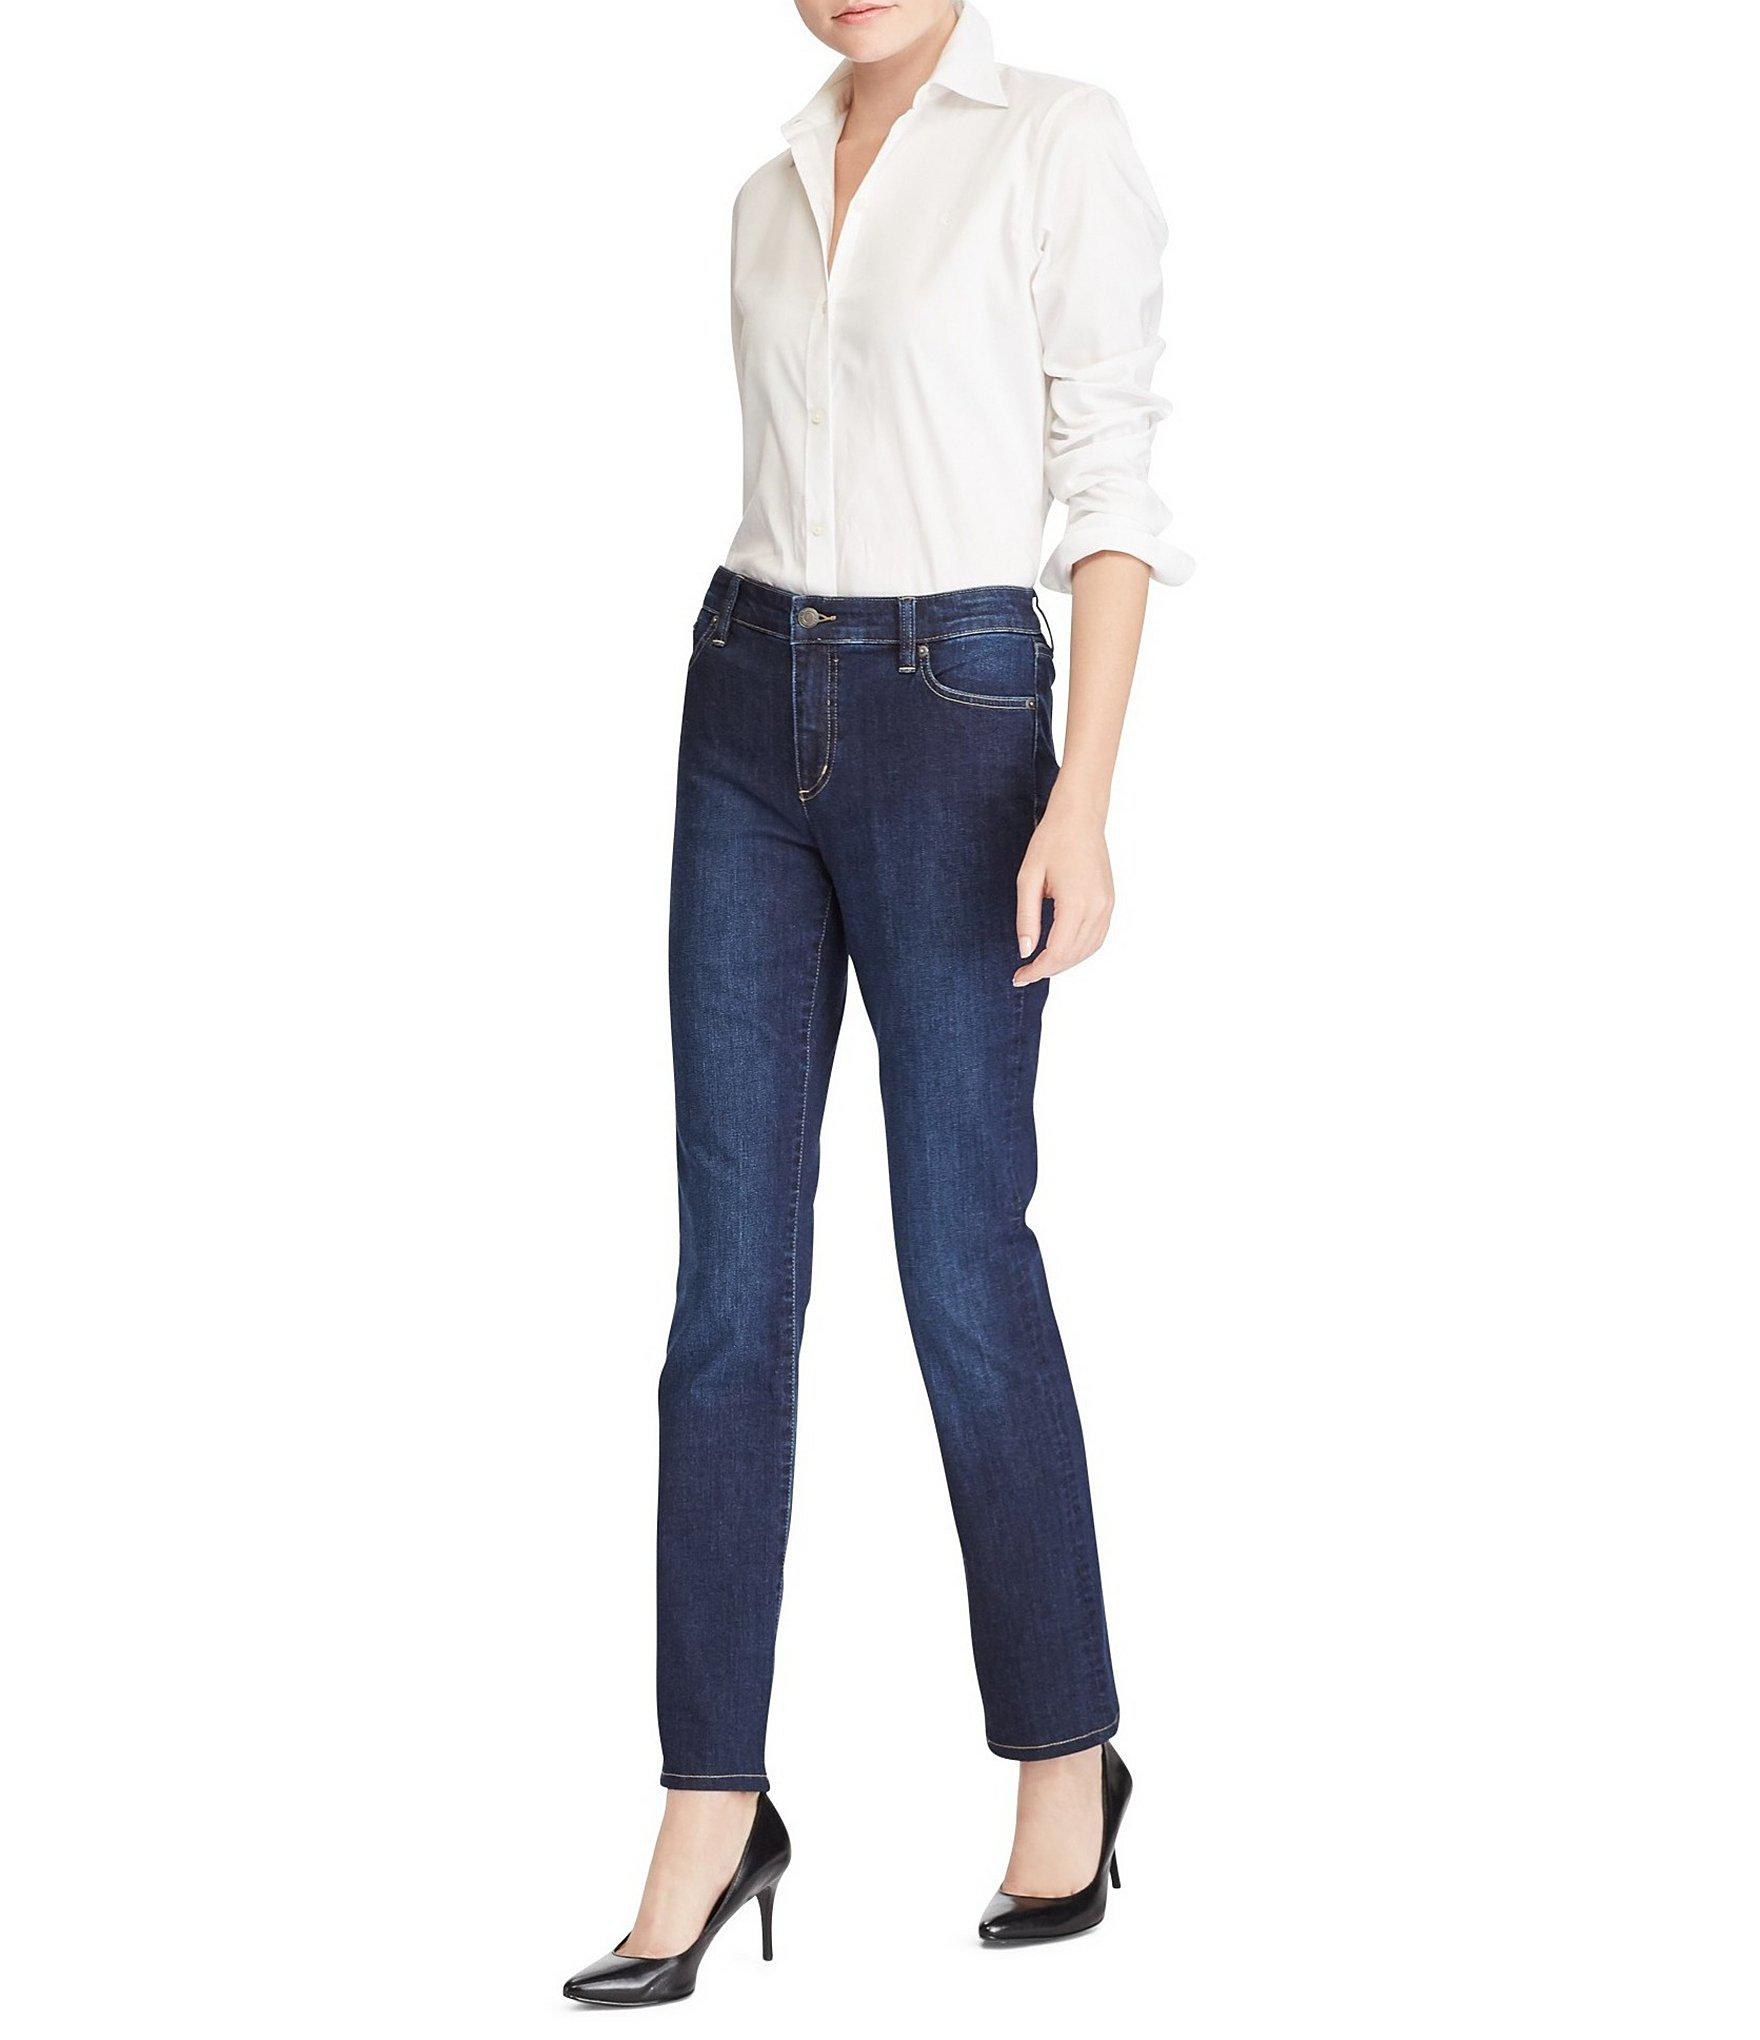 0e8998e352cf5 Lauren by Ralph Lauren - Blue Stretch Denim Premier Straight-leg Jeans -  Lyst. View fullscreen